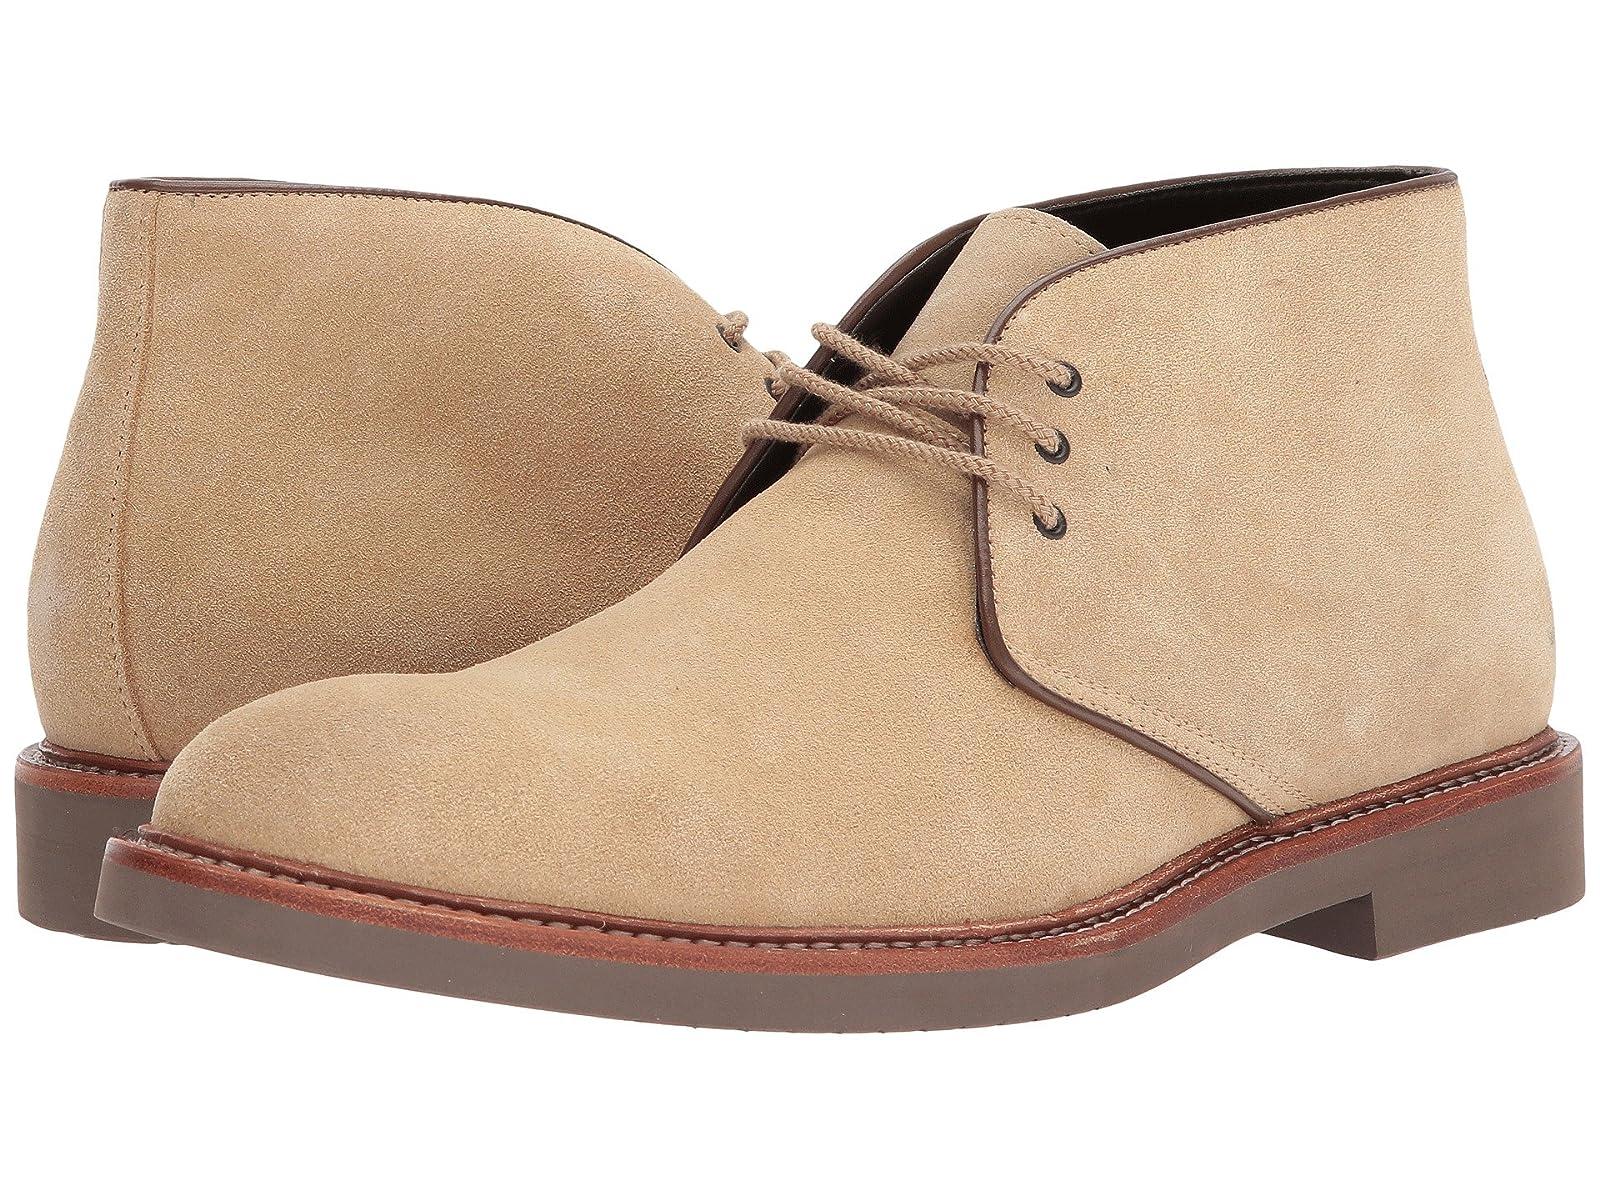 Tallia Orange FrancescoCheap and distinctive eye-catching shoes